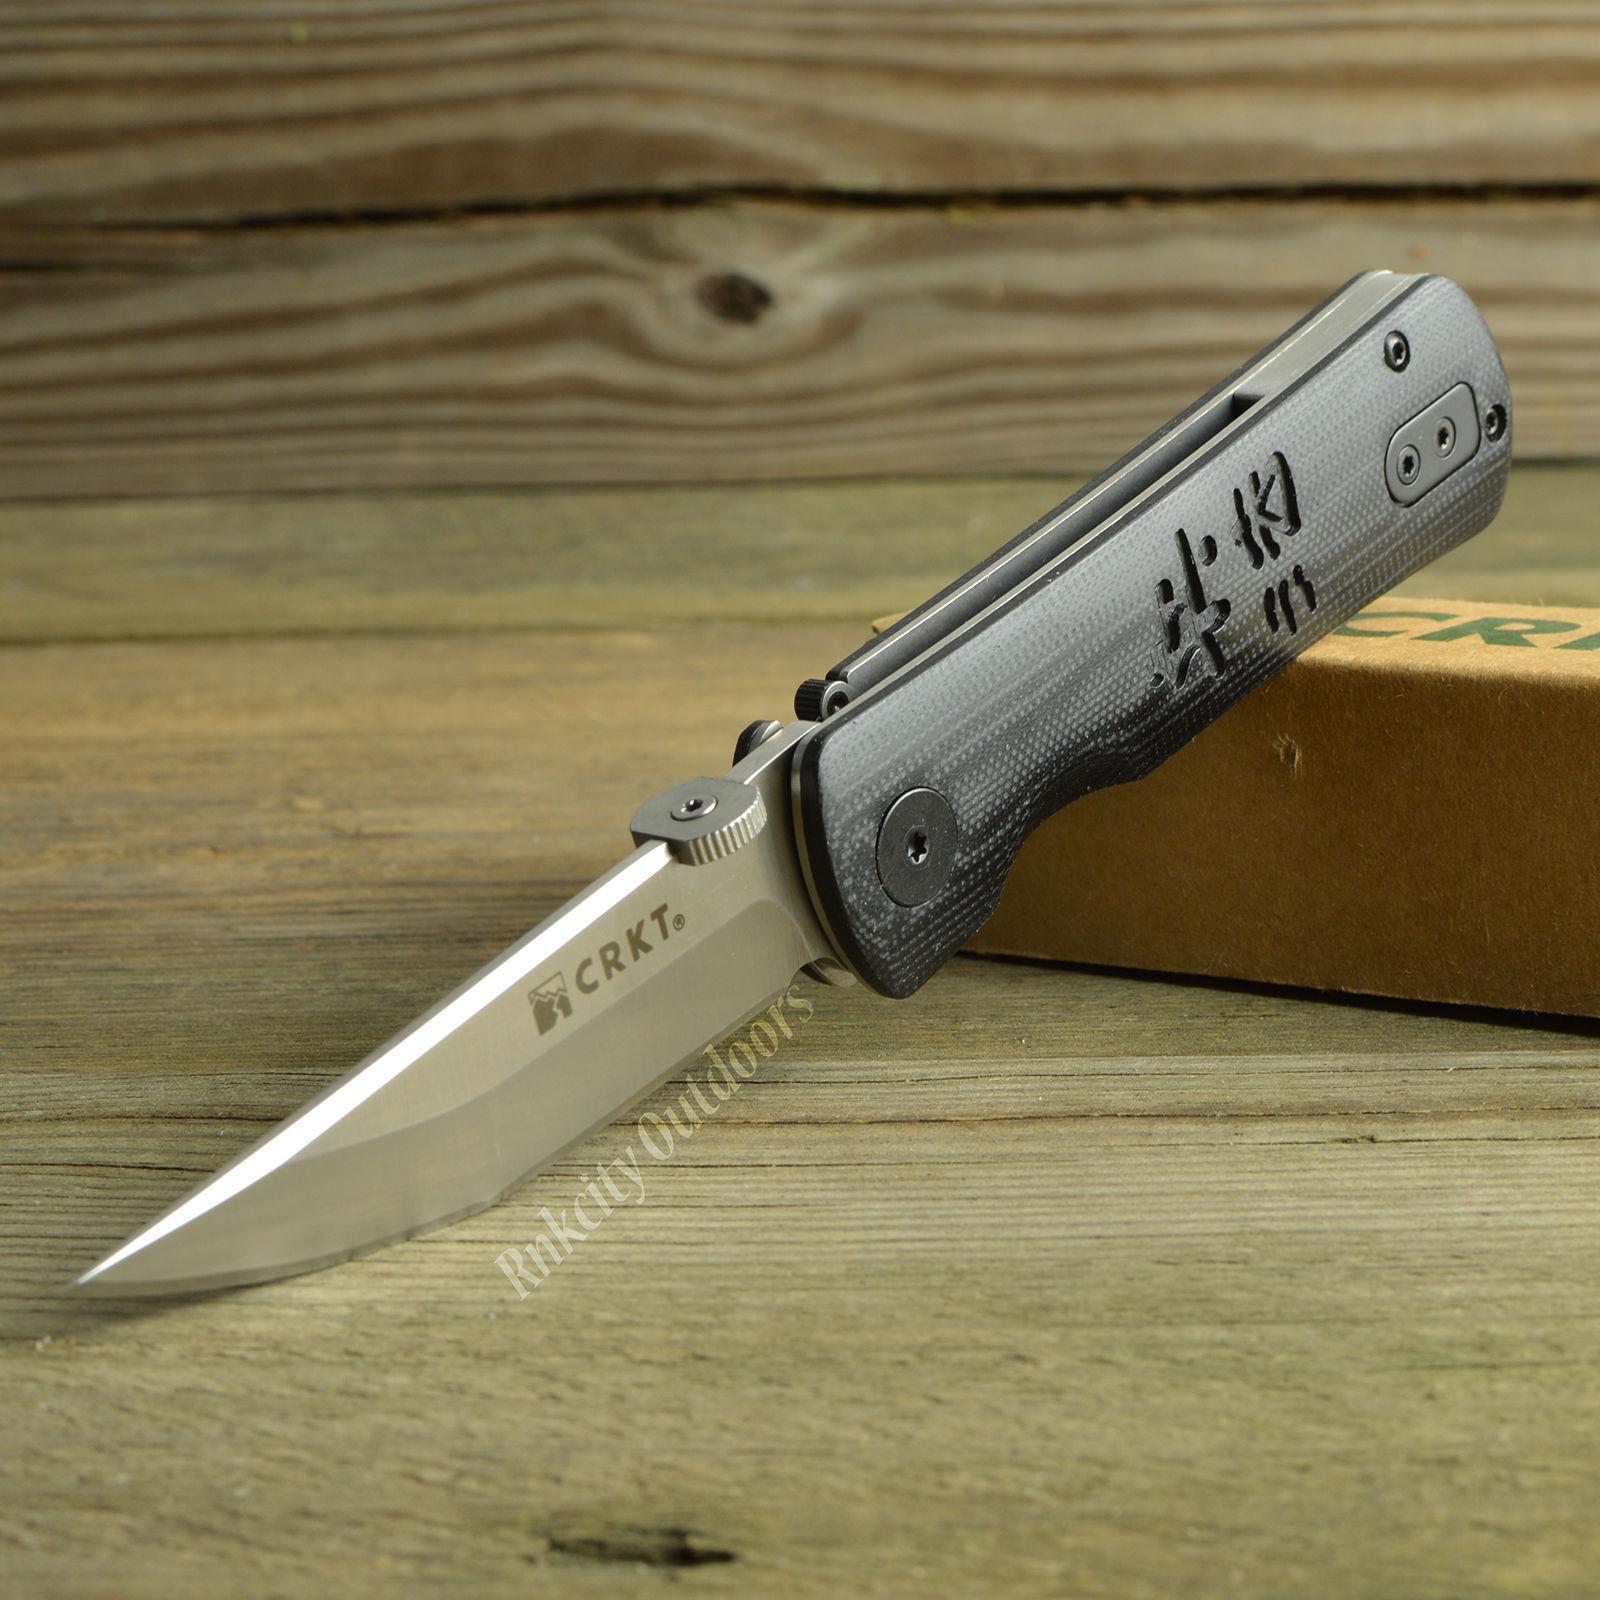 Cr2900 CRKT Hissatsu 2 Tactical a o Blade 8cr14mov g-10 handle linerlock clip